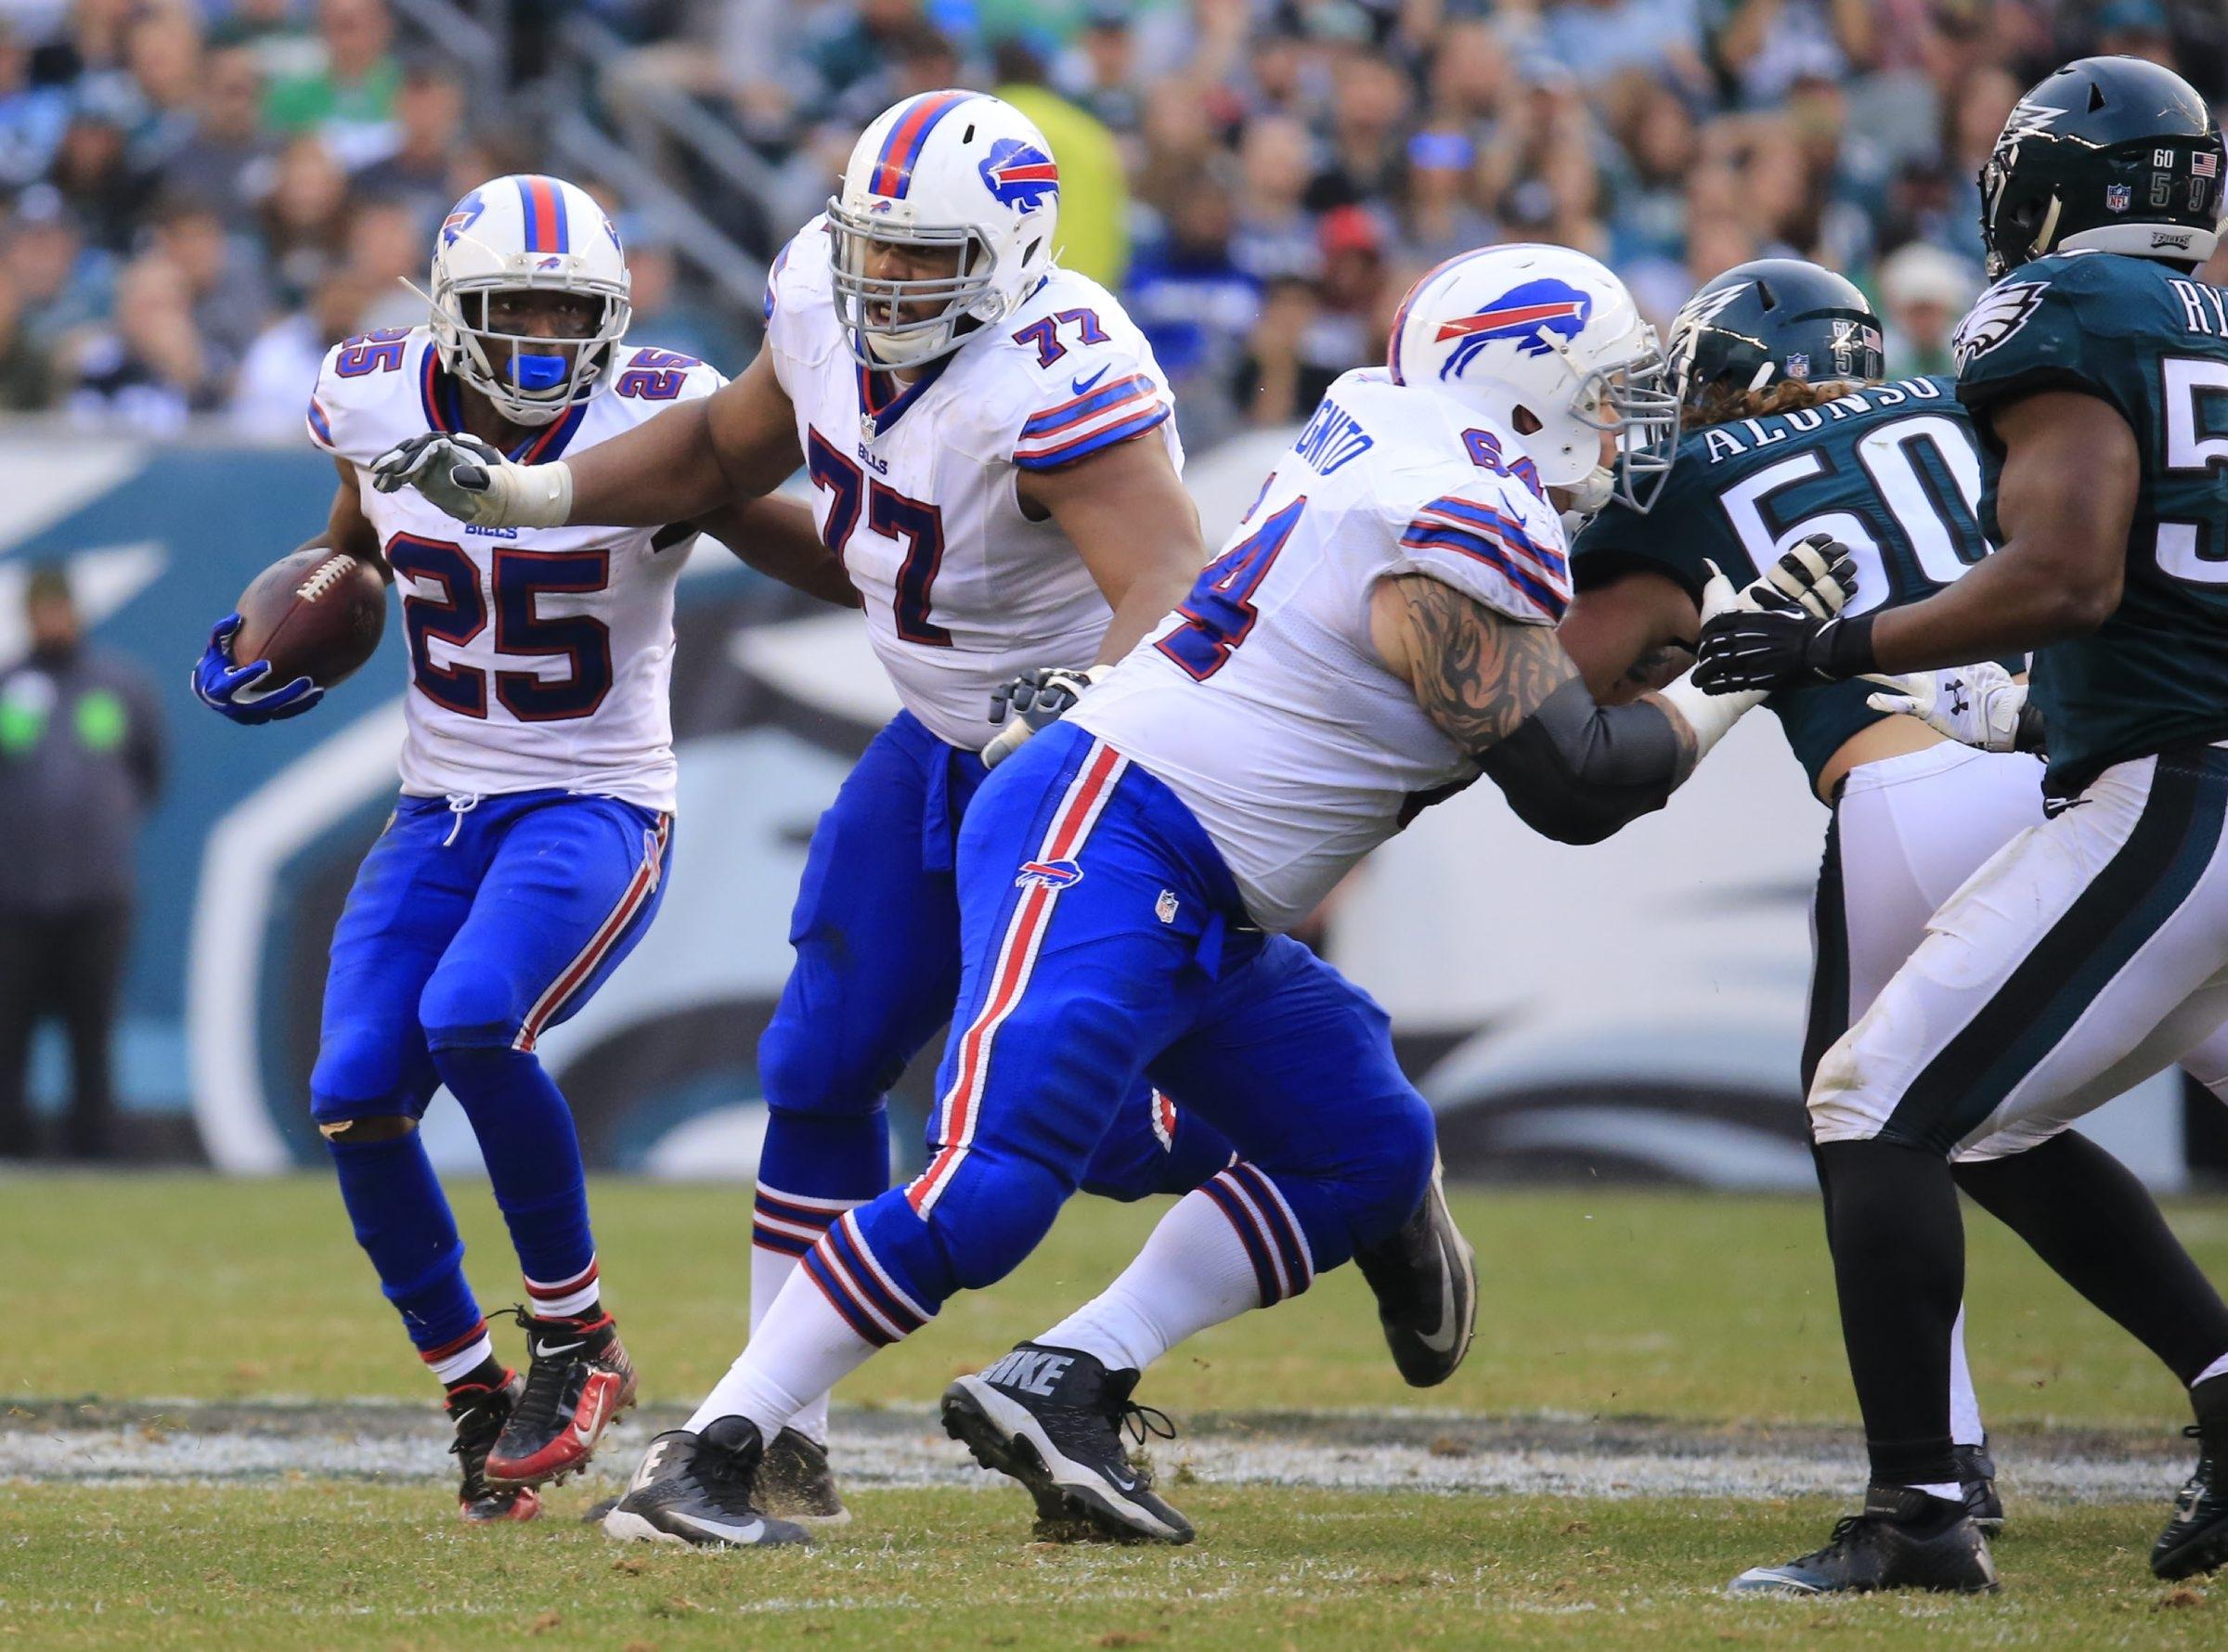 Buffalo Bills LeSean McCoy follows his blocks against the Philadelphia Eagles during second half action at Lincoln Financial Field on Sunday, Dec. 13, 2015.  (Harry Scull Jr./Buffalo News)